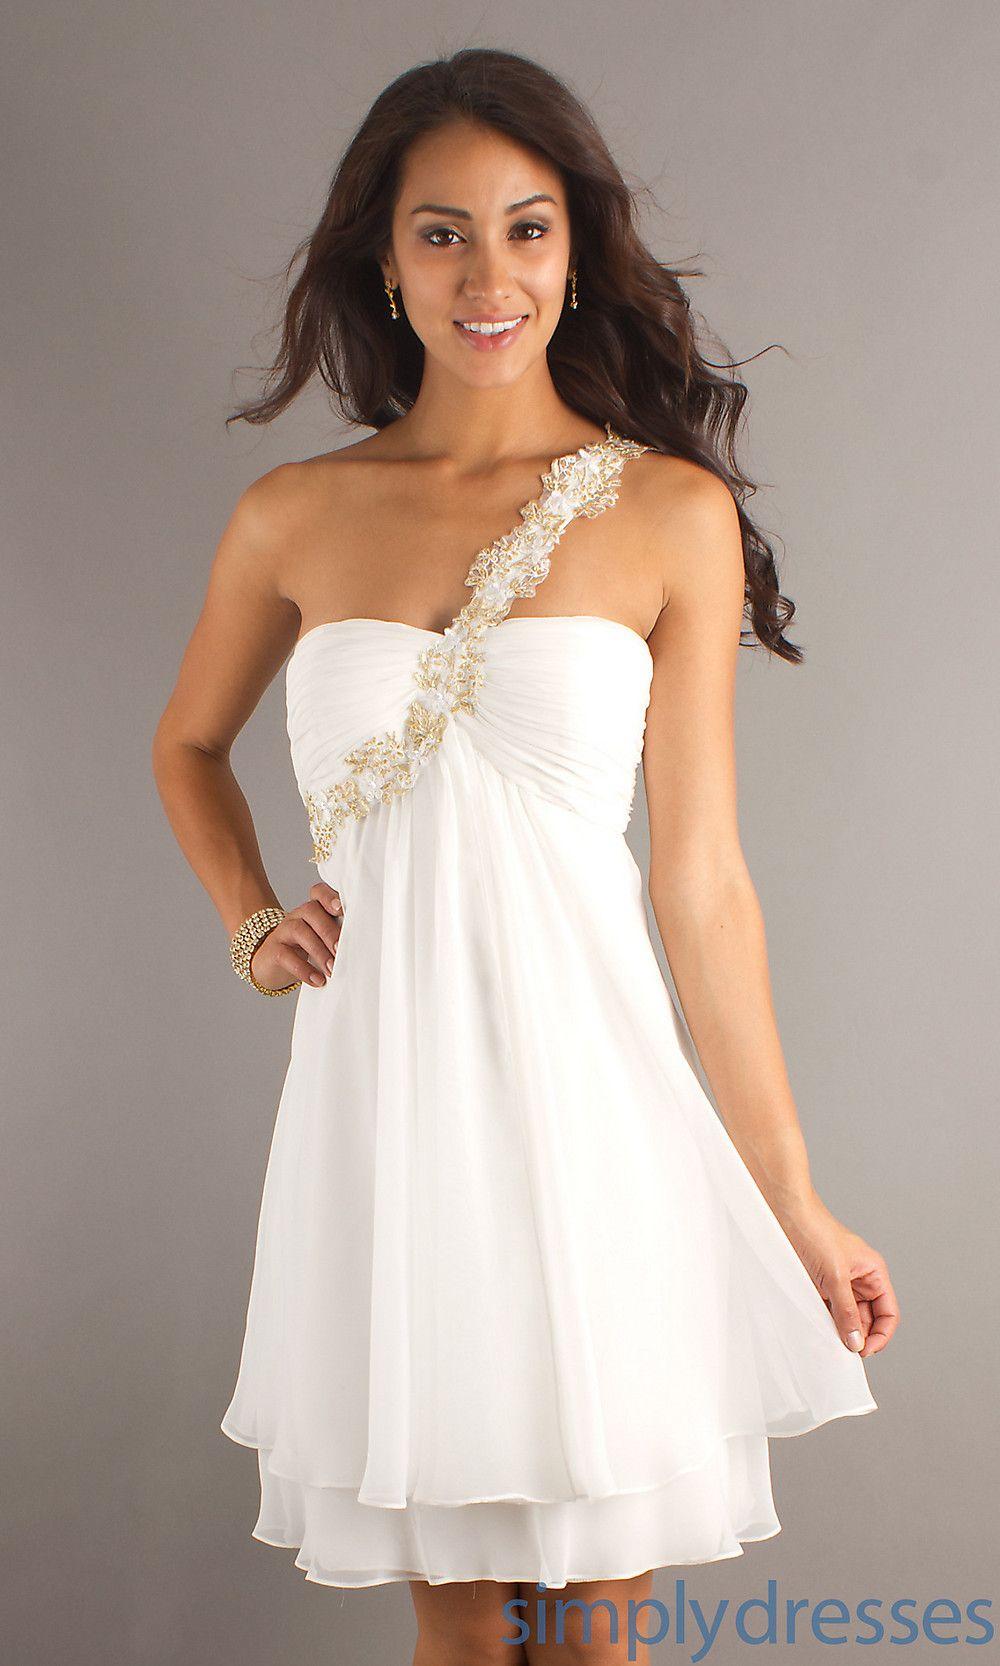 Party Dress Graduation Dress Short Ivory Dress - Simply Dresses ...